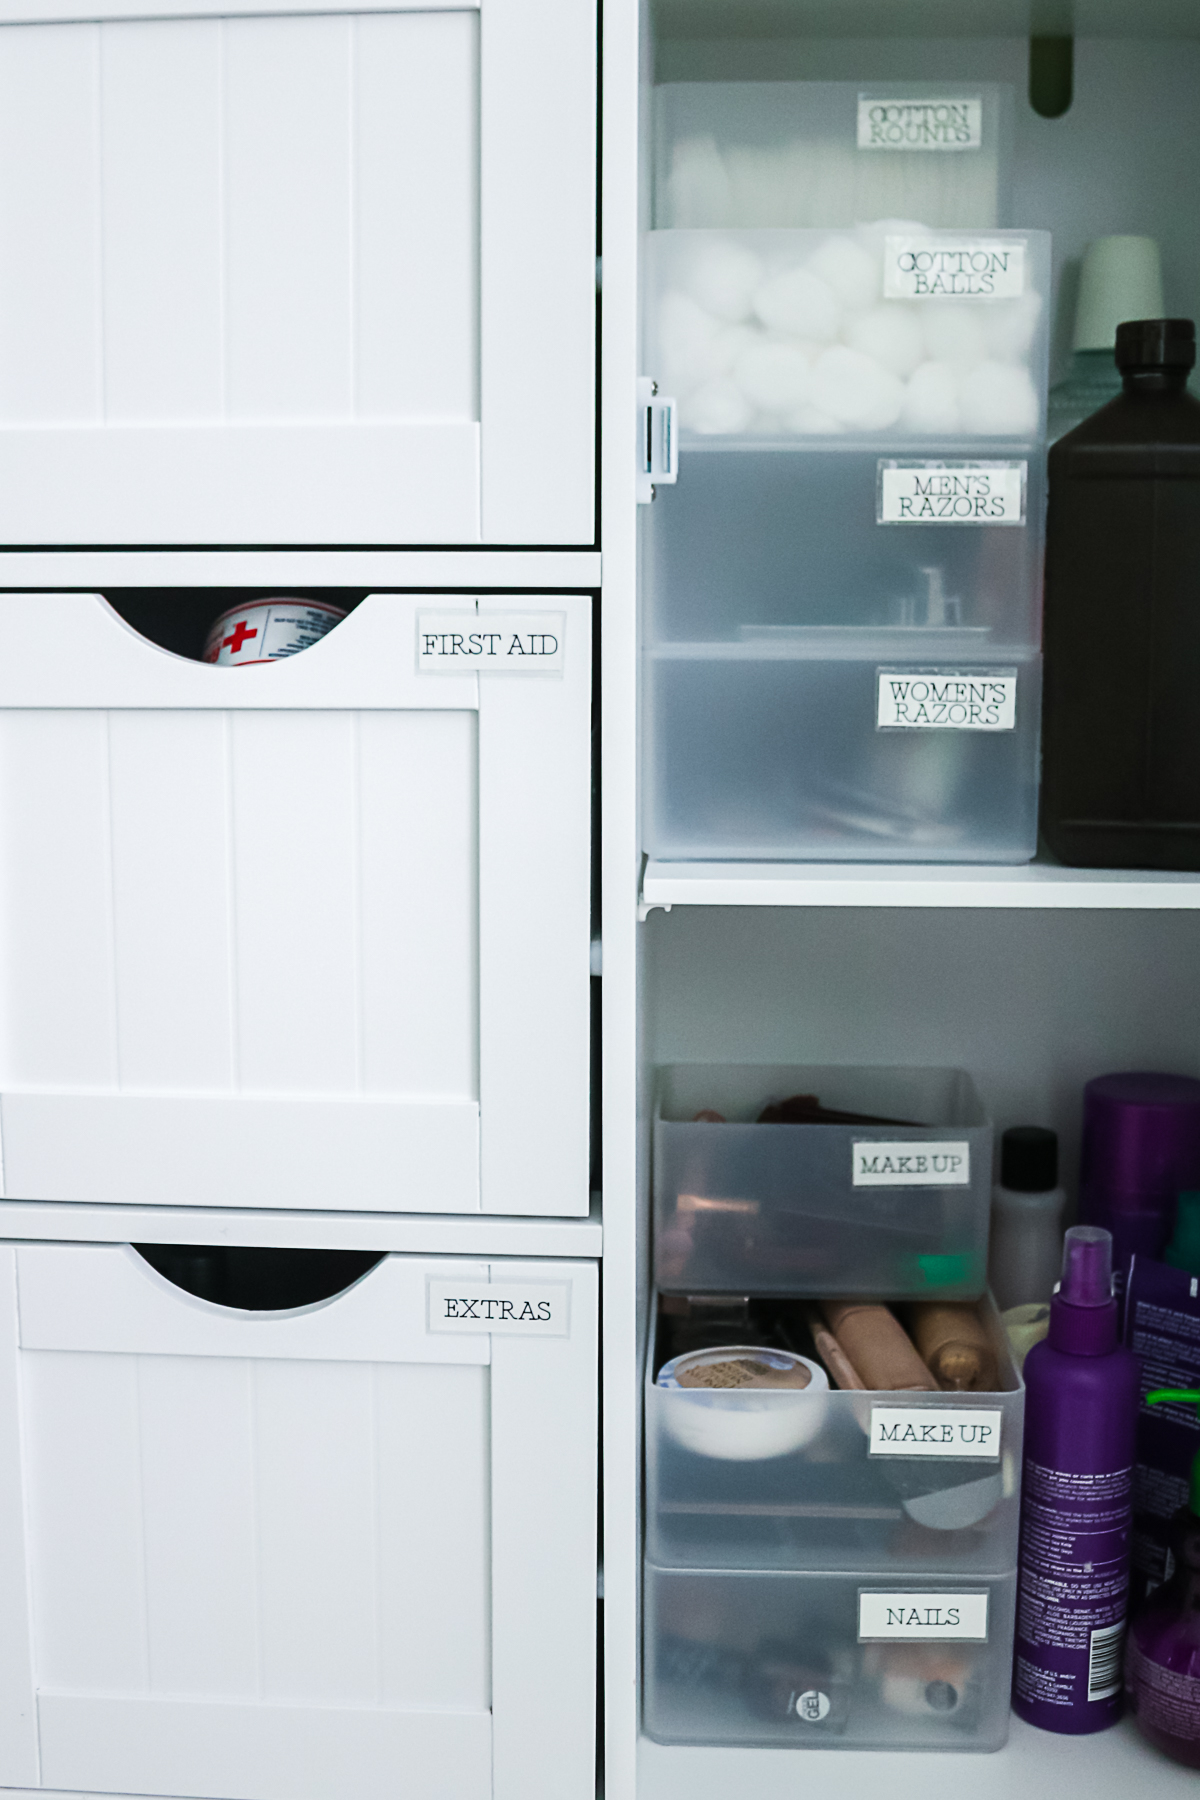 labels on bathroom bins